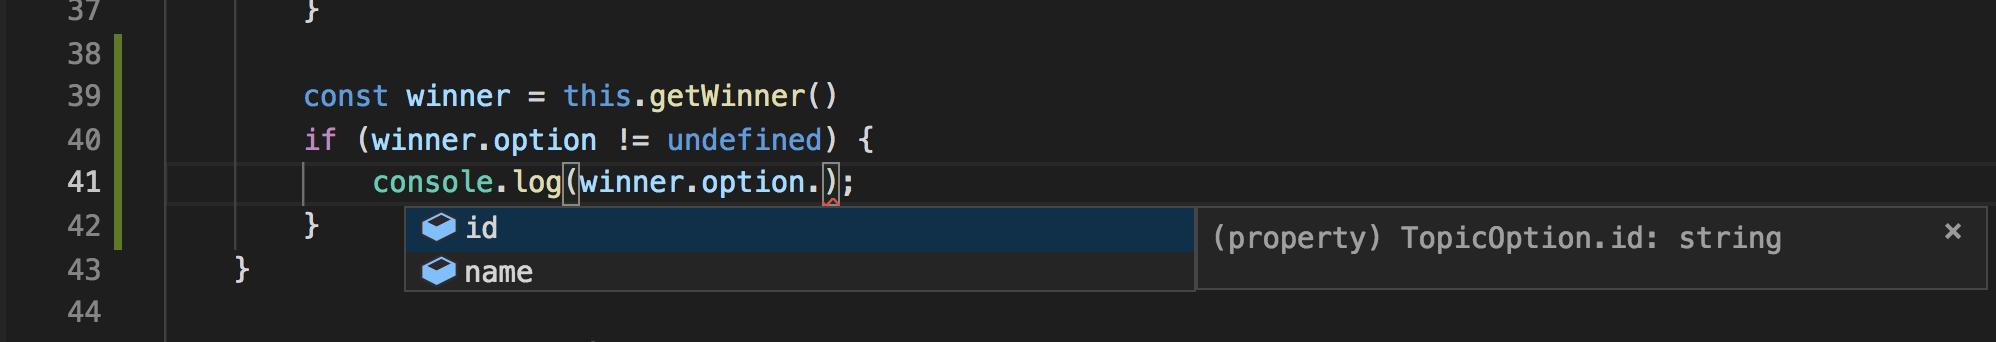 Visual Studio Code: TopicOption id